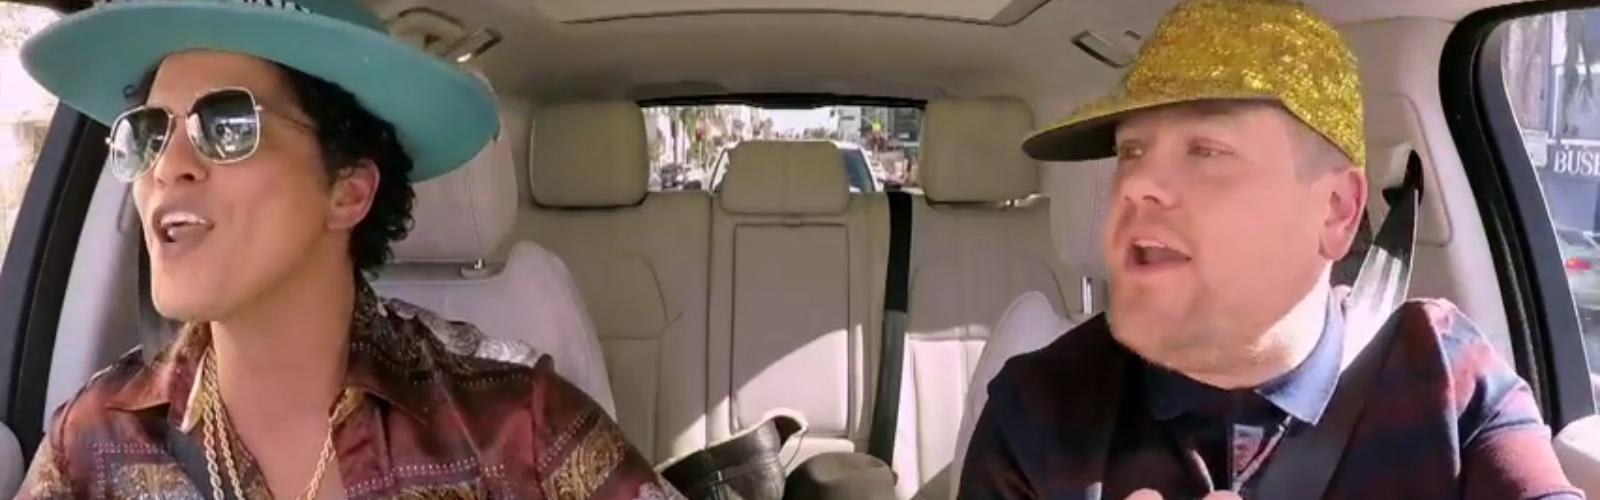 Carpoolkaraoke